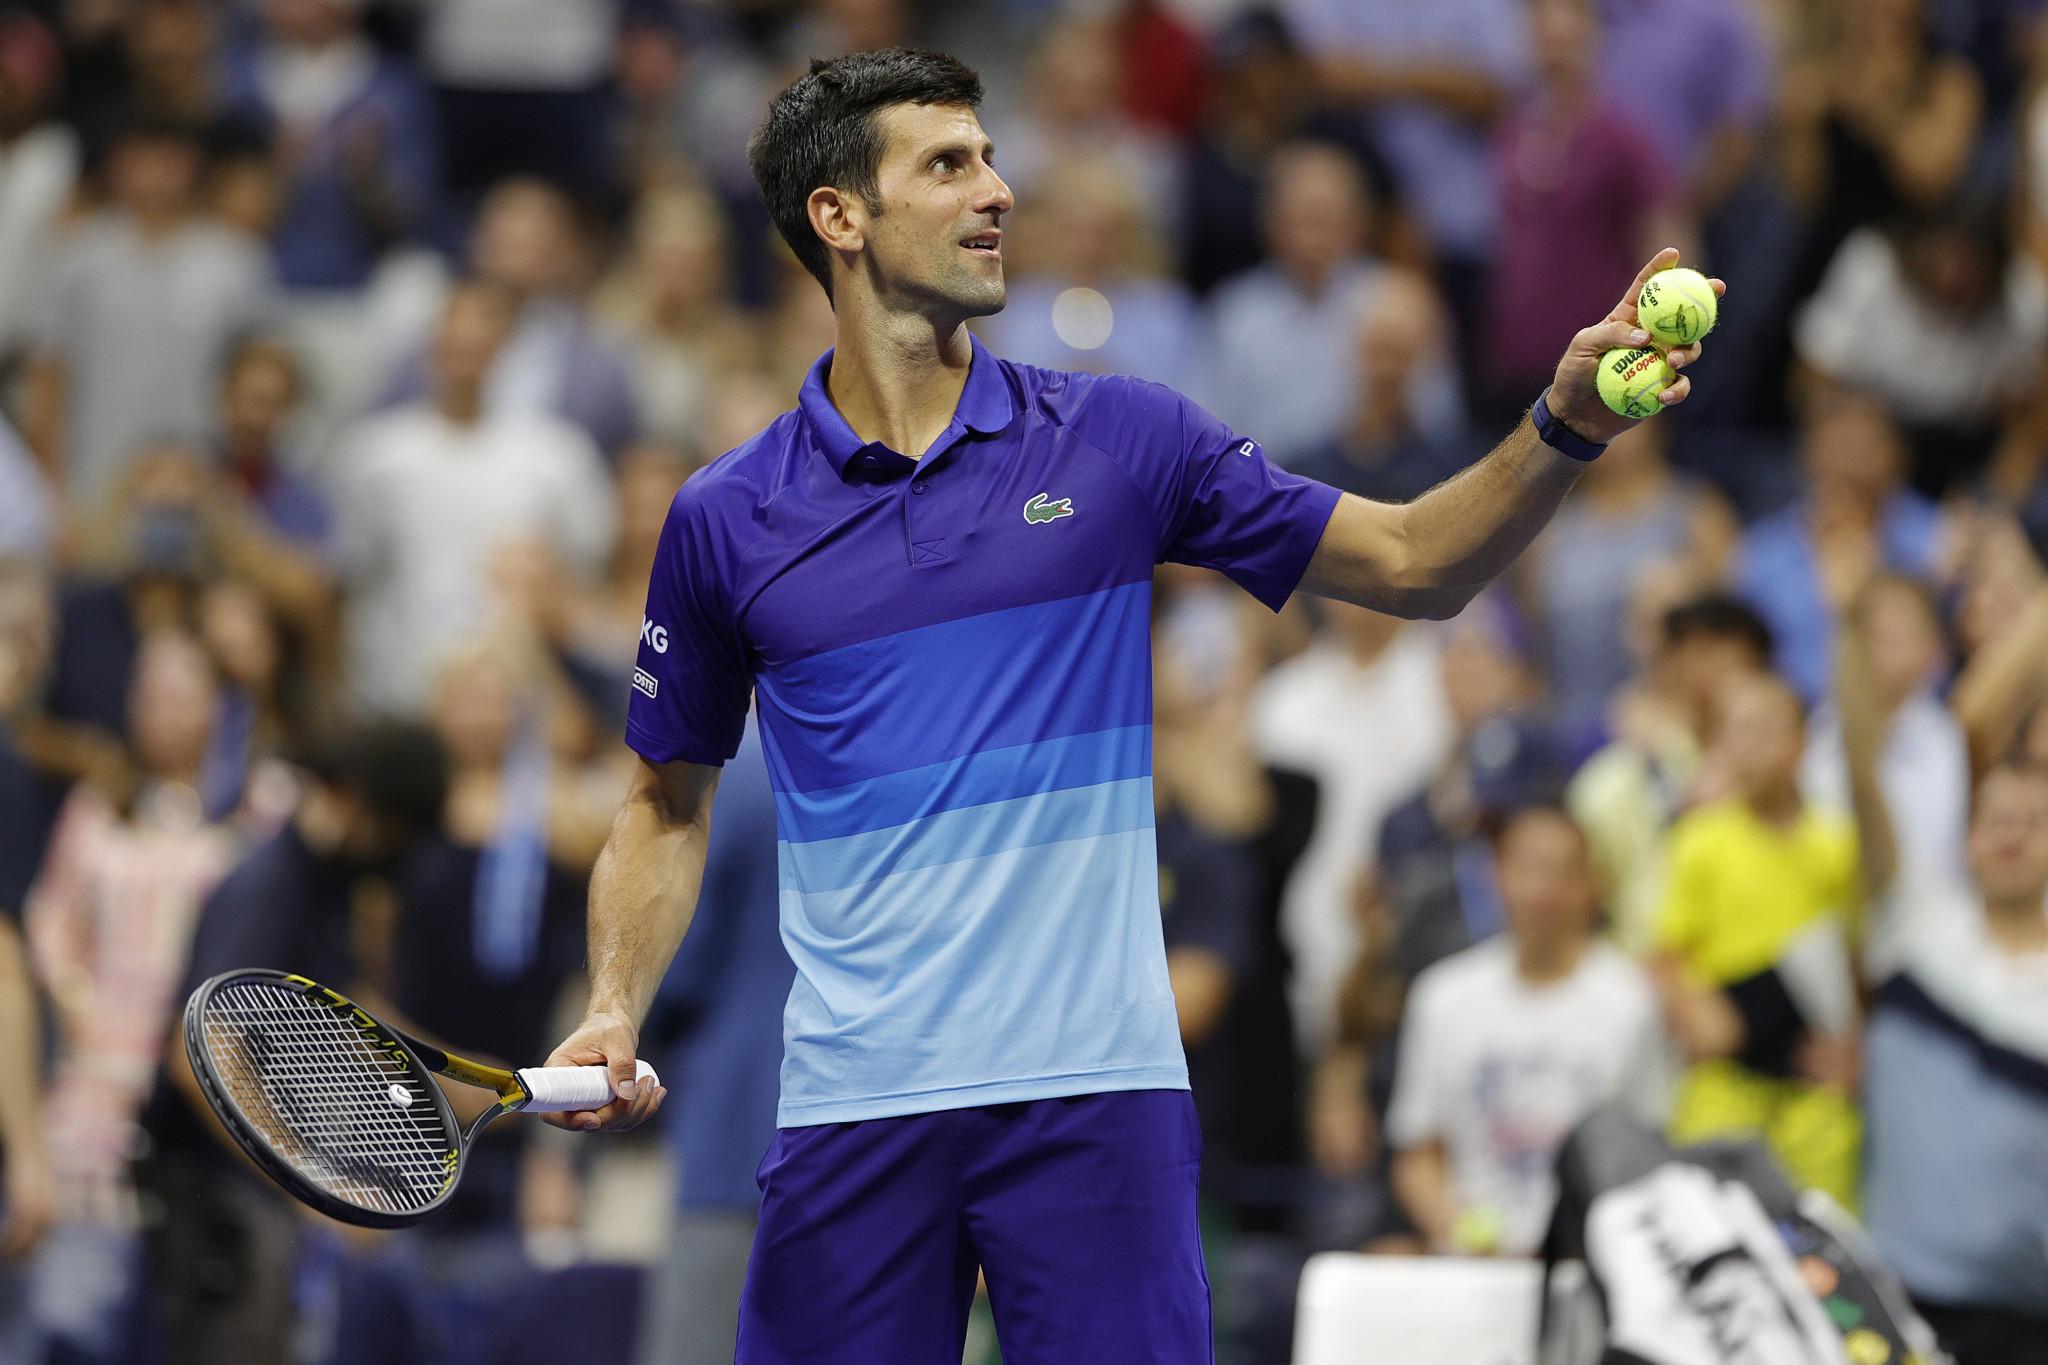 Djokovic begins search for calendar Grand Slam at US Open, while Zverev progresses